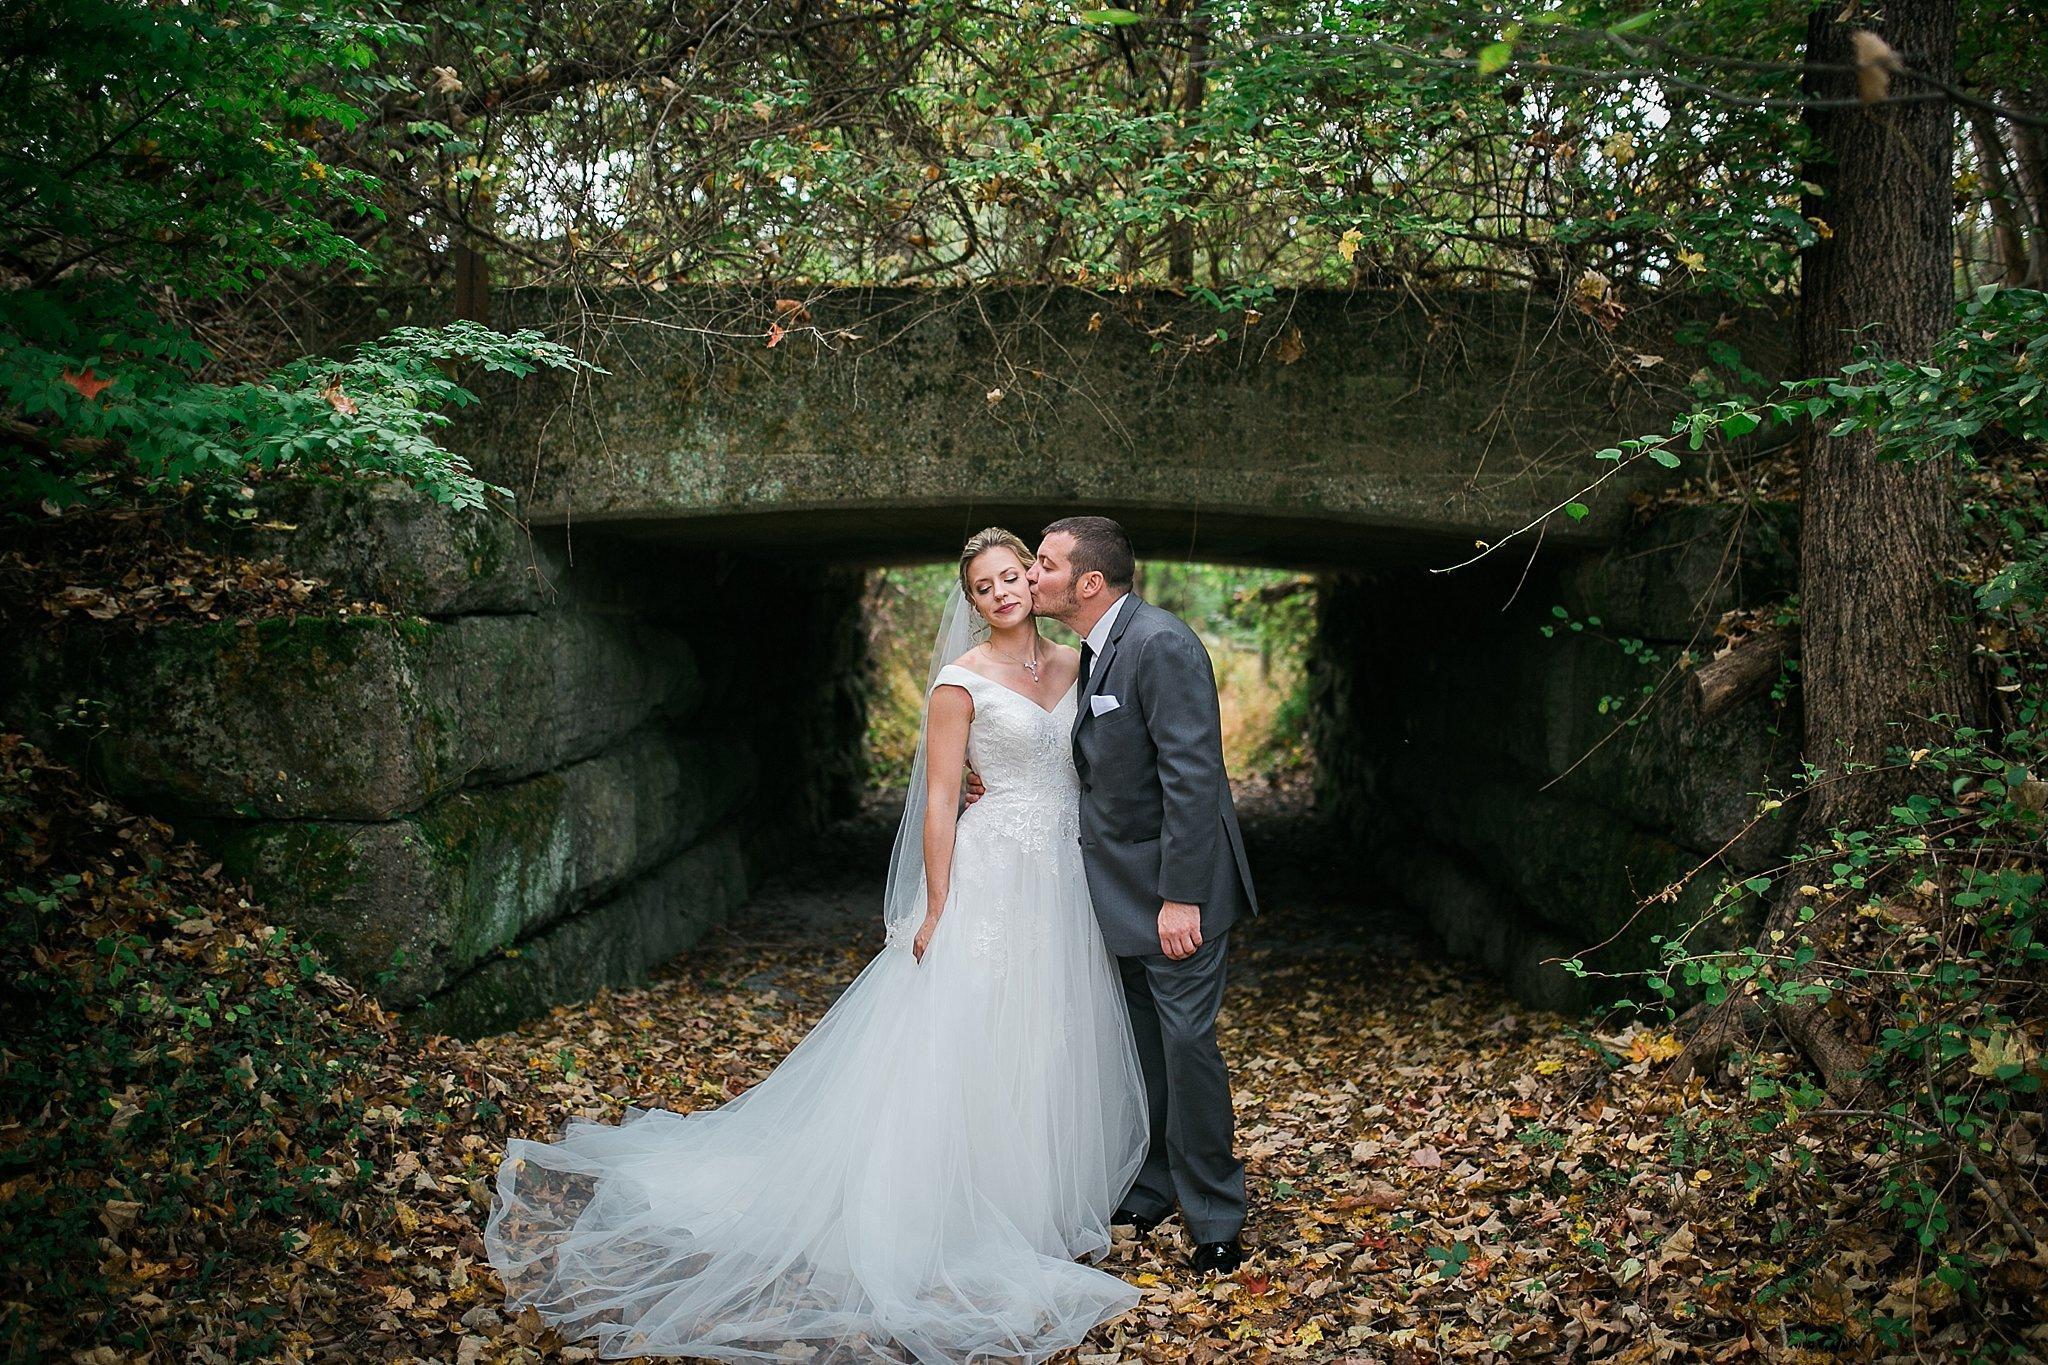 New Windsor New York Hudson Valley New York Wedding Photographer 27.jpg